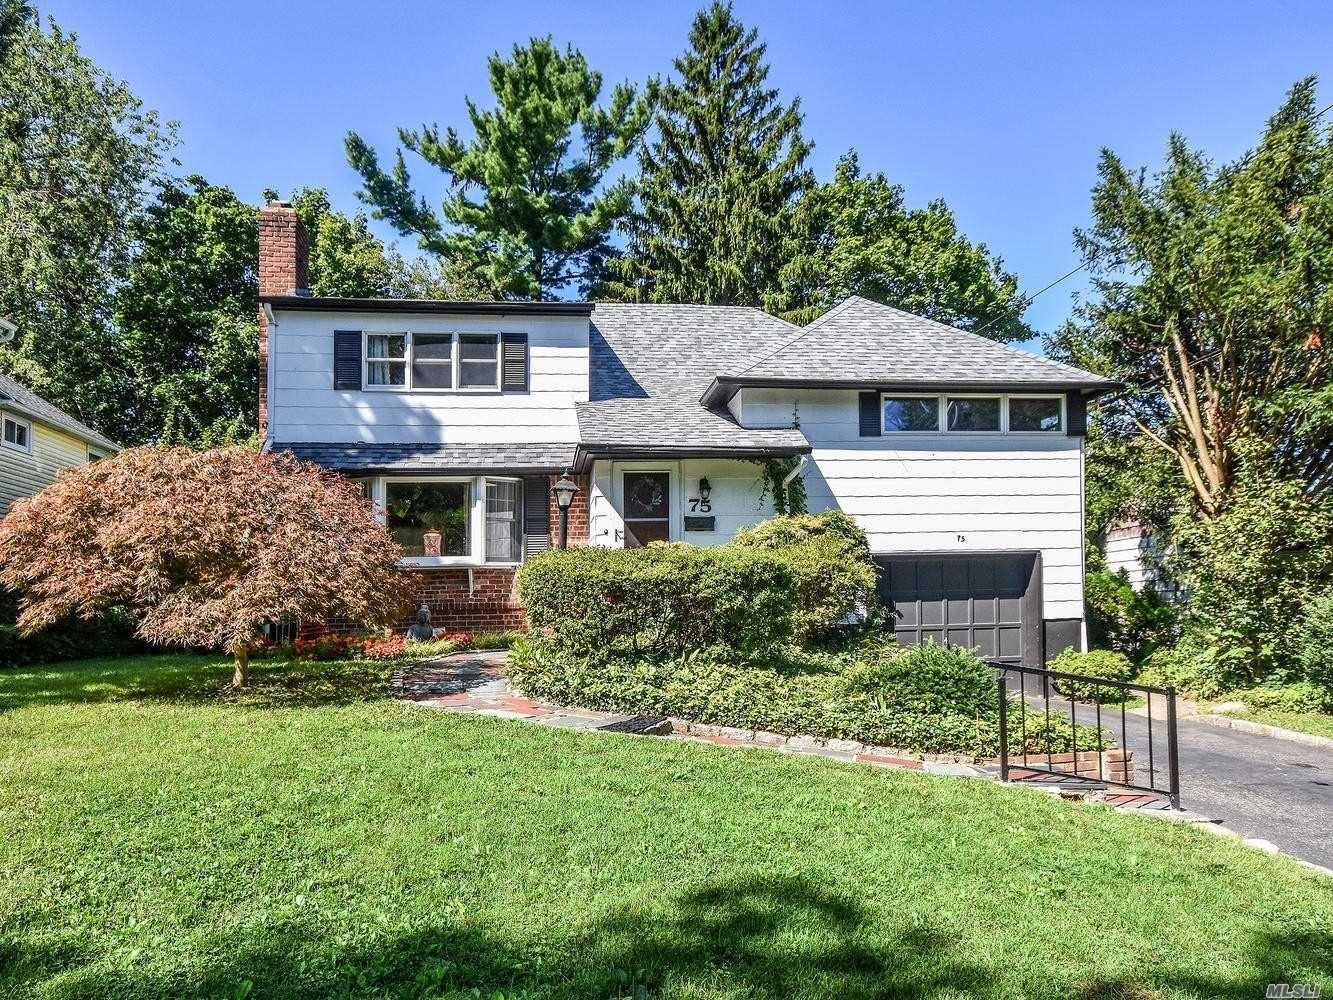 75 Birch Street, Port Washington, NY 11050 - MLS#: 3215038